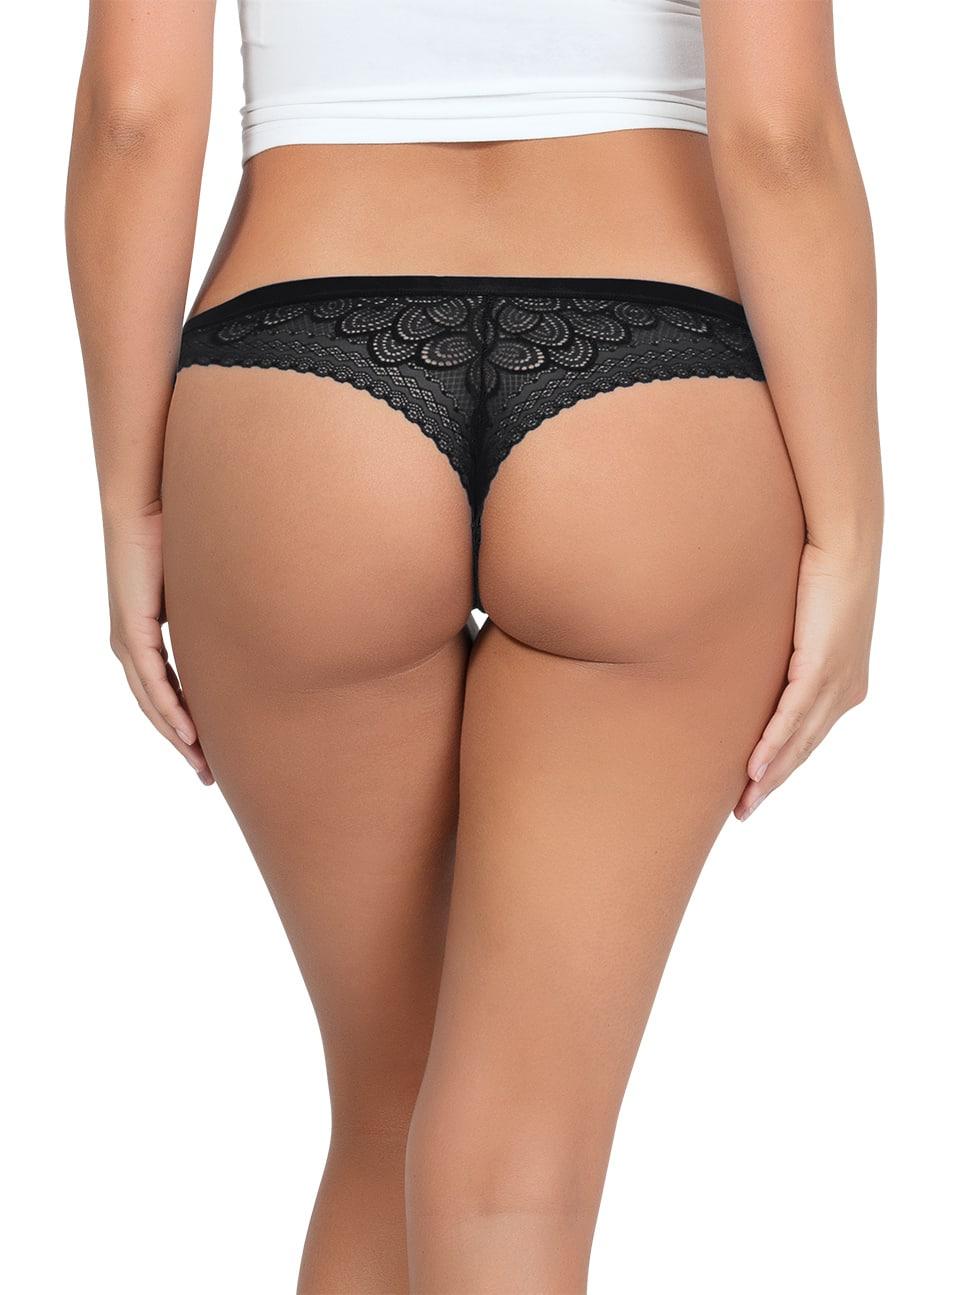 ParfaitPanty SoGlam ThongPP402 black back - Panty So Glam Thong - Black - PP402